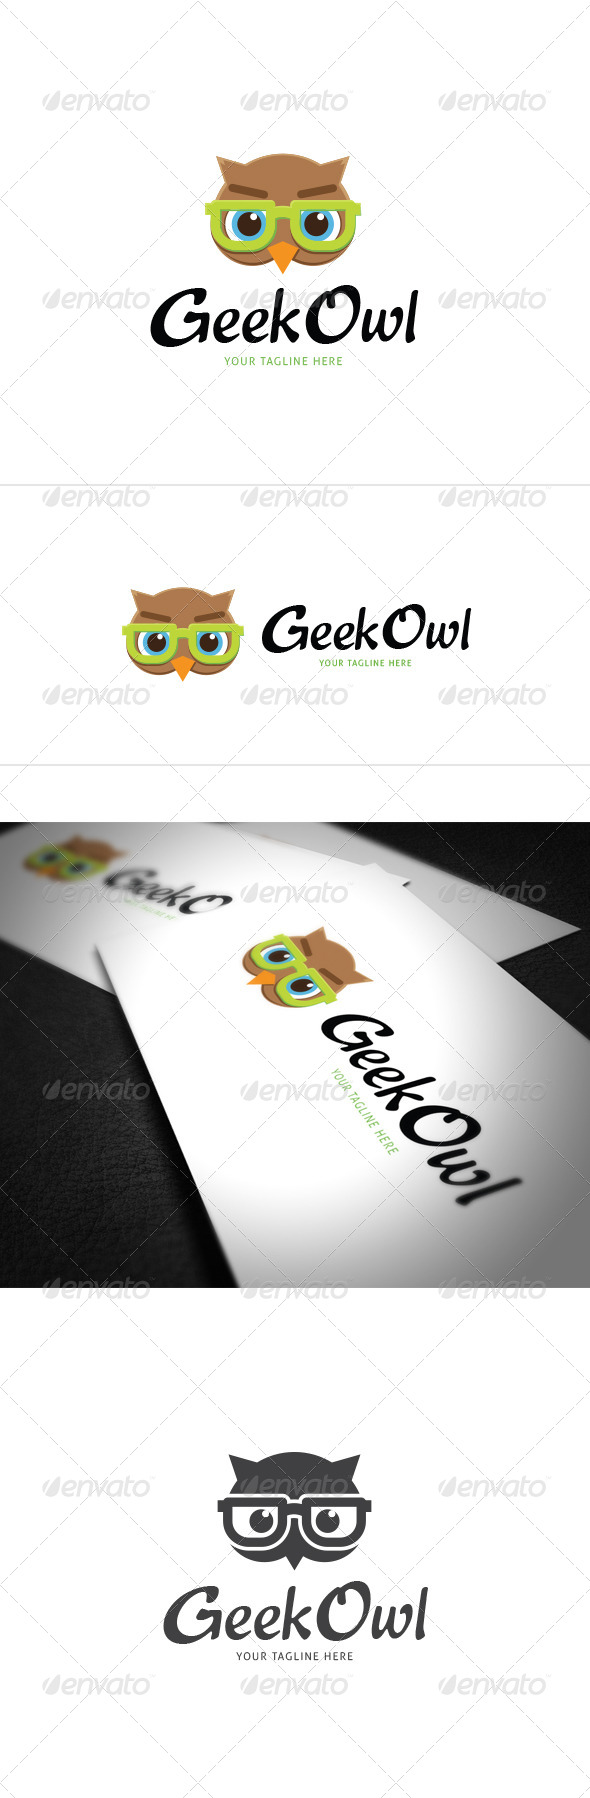 GraphicRiver Geek Owl Logo Template 7994320